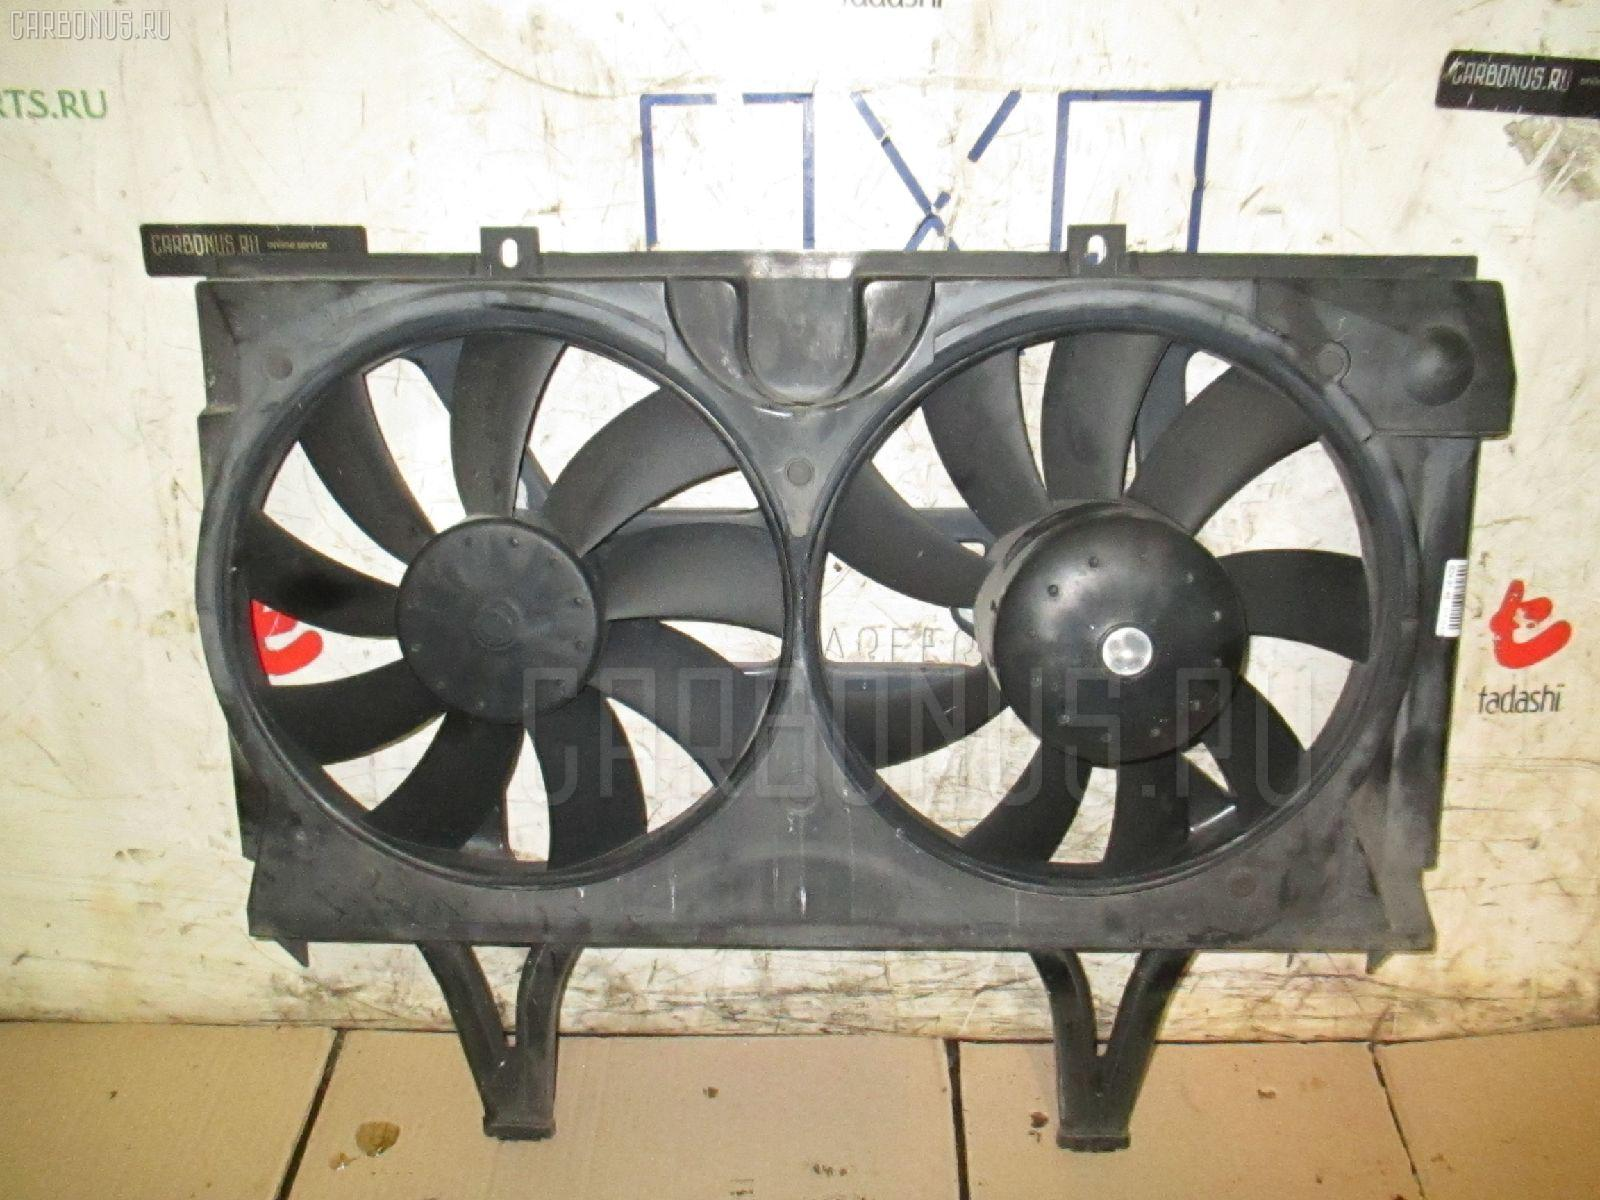 Вентилятор радиатора кондиционера MERCEDES-BENZ E-CLASS STATION WAGON S210.265 112.941 Фото 1